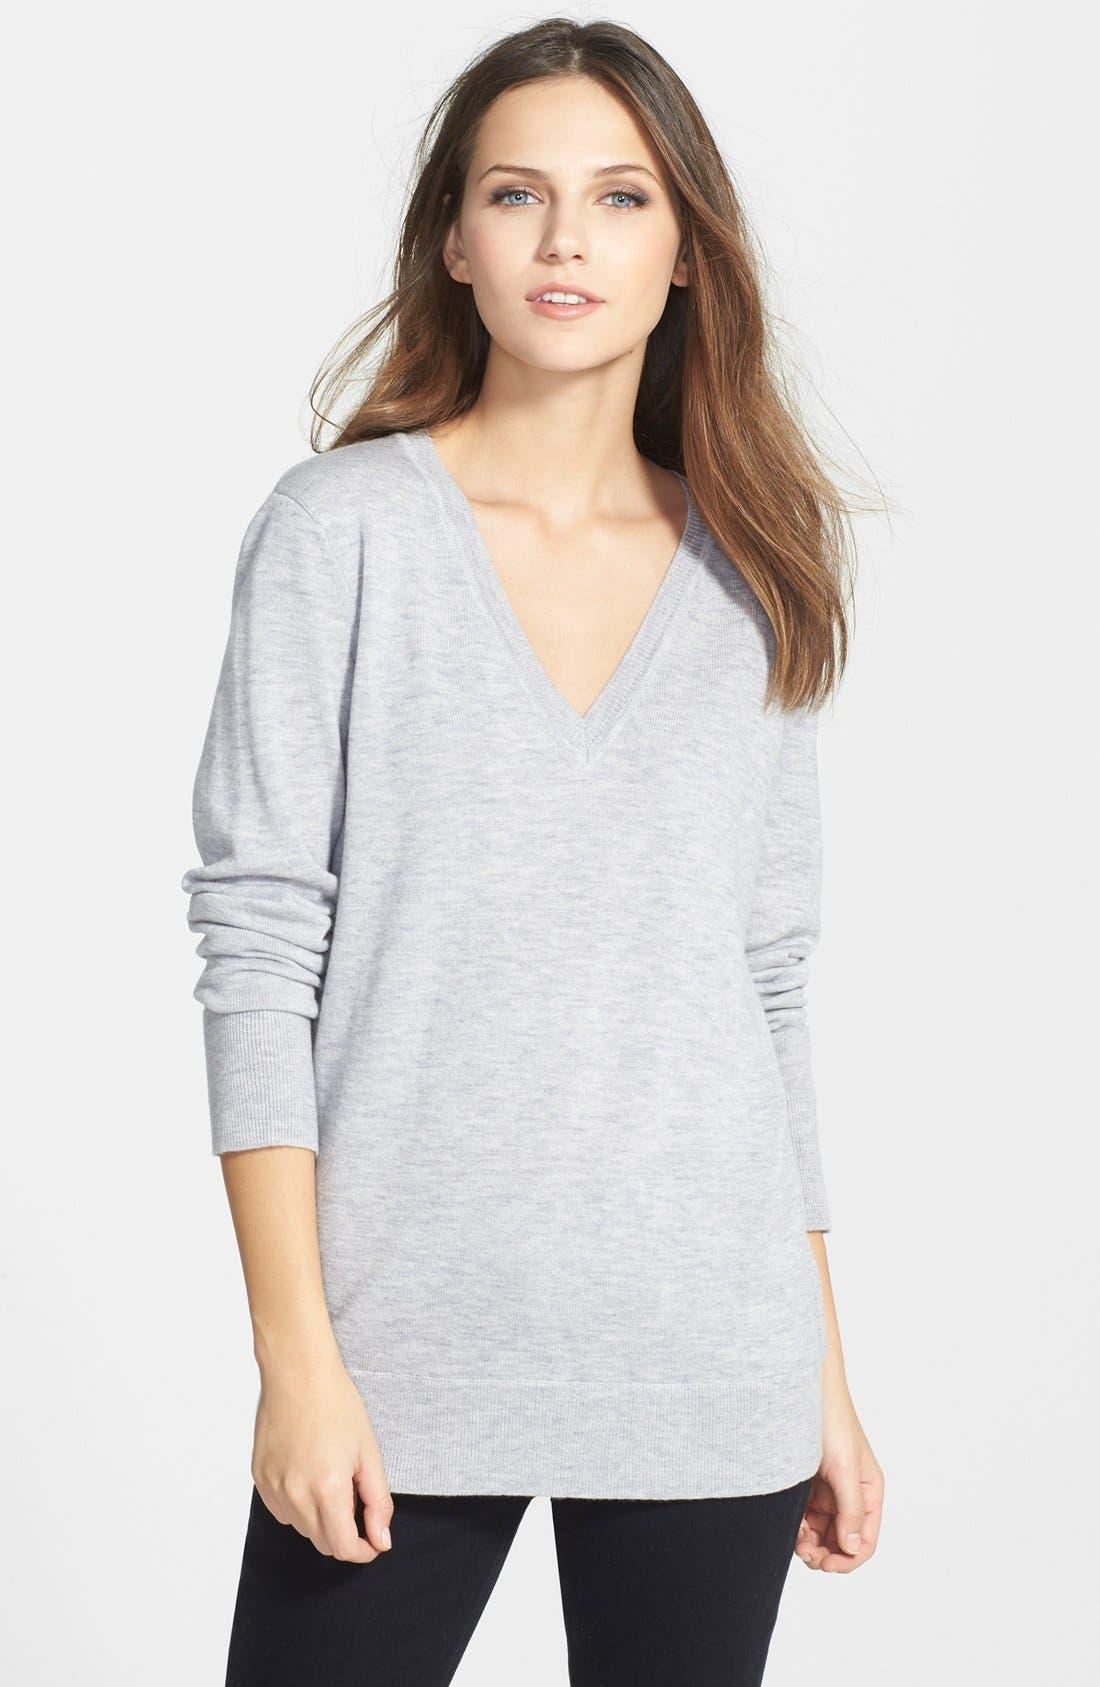 Alternate Image 1 Selected - rag & bone/JEAN 'Natalie' Merino Wool V-Neck Sweater